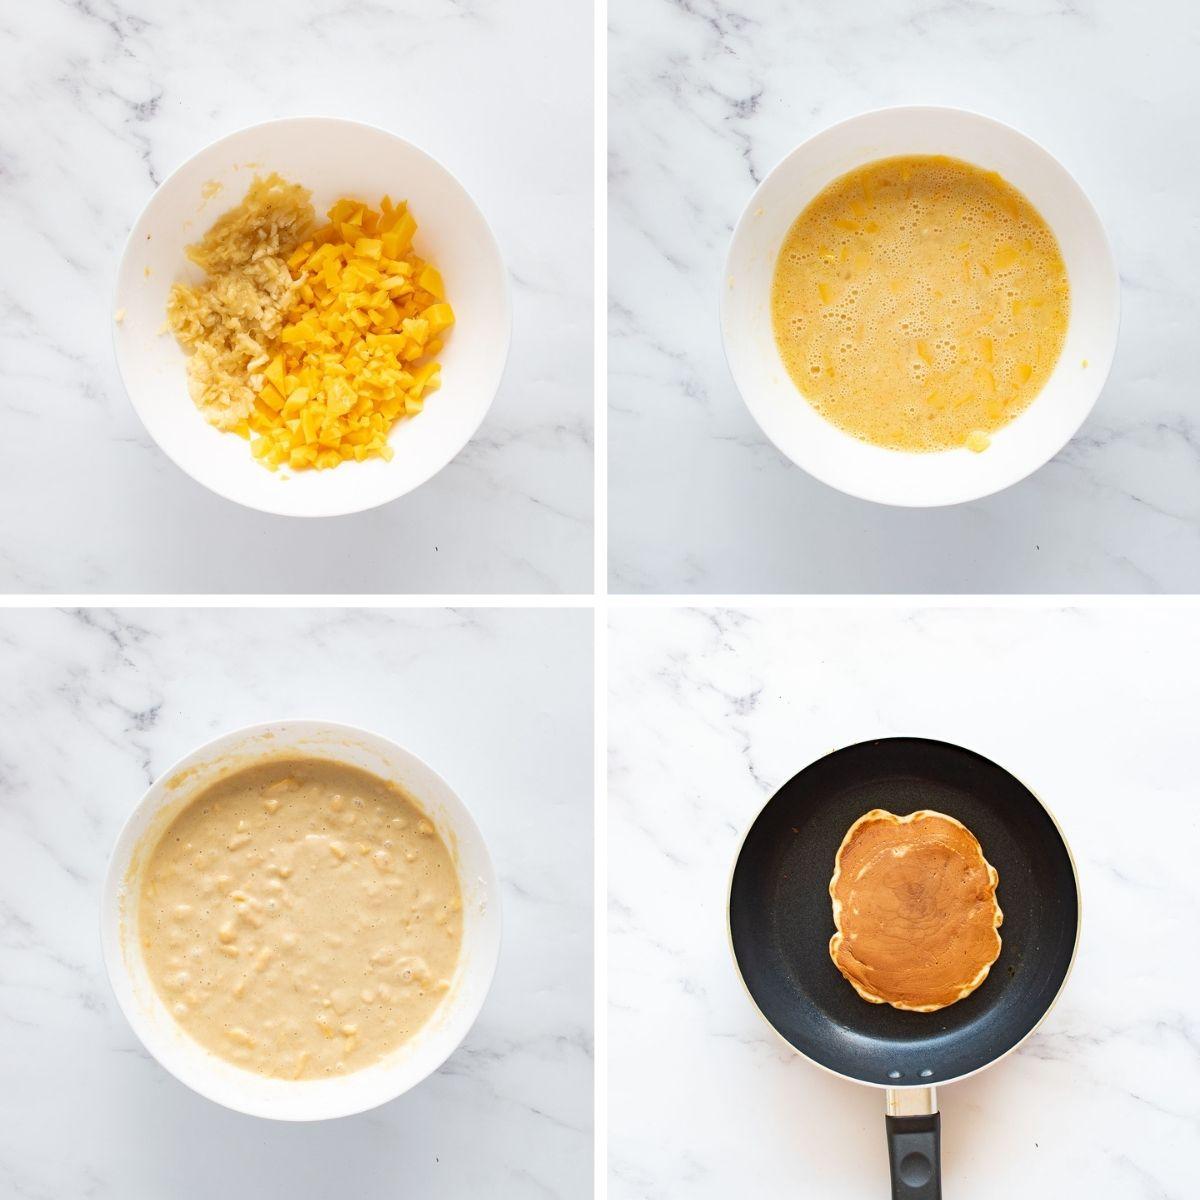 Step by step ingredients to make mango pancakes.